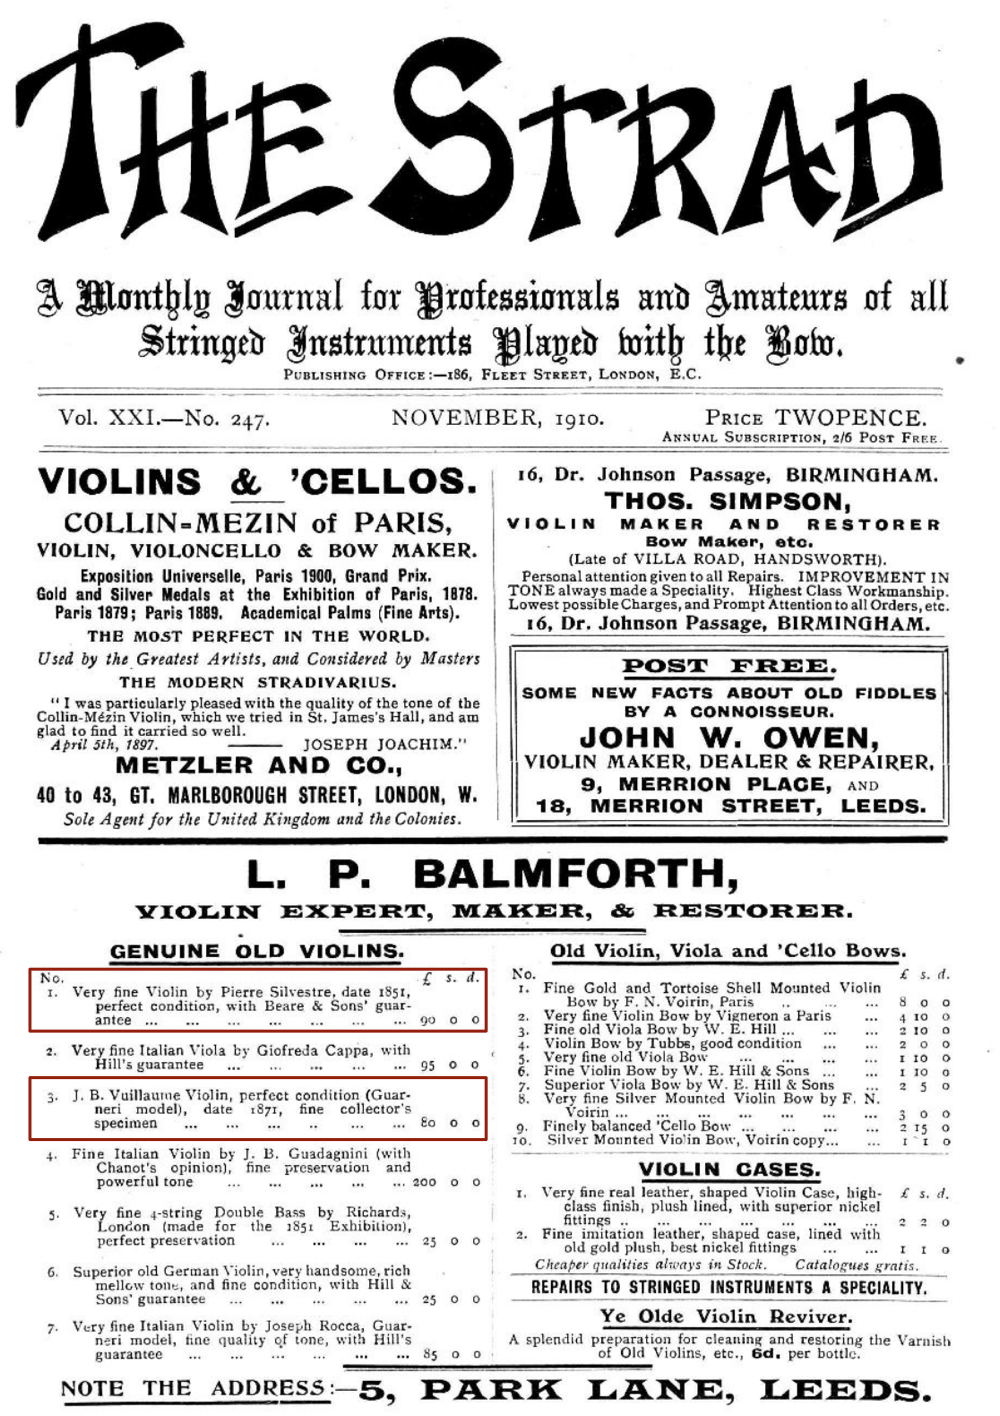 The Strad advert 1910